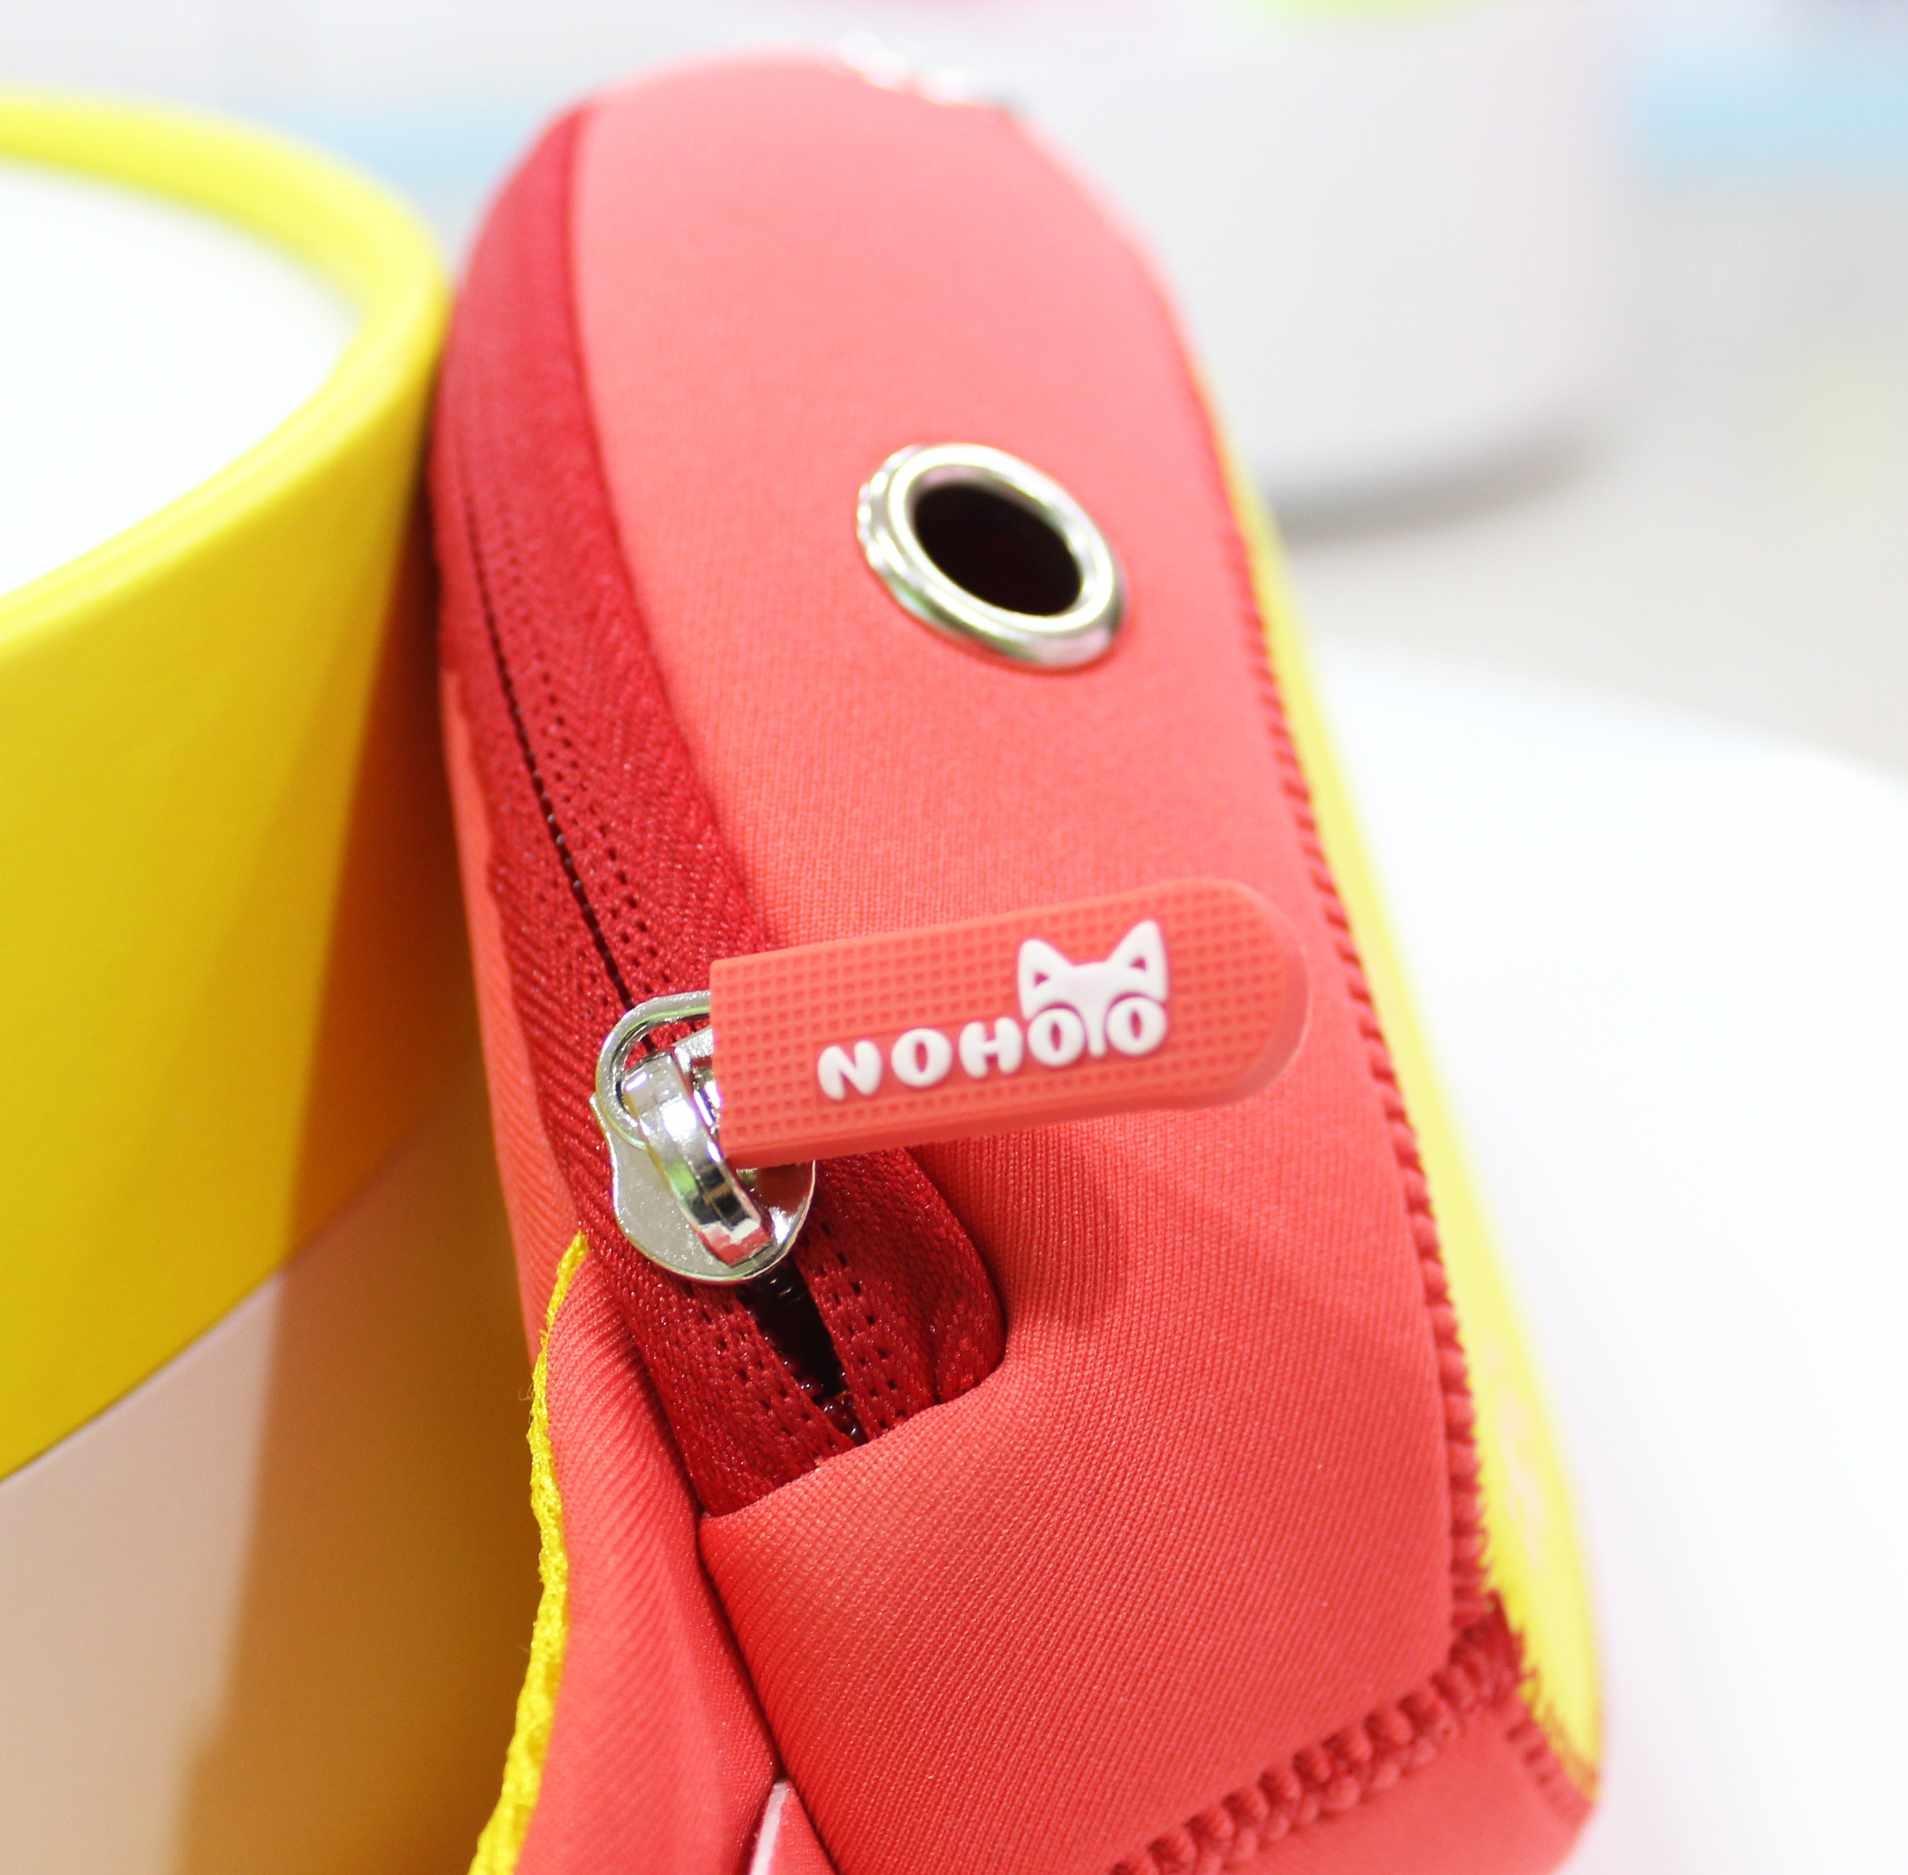 NHY001 Soft neoprene lightweight kindergarten baby waist bag for preschool kids